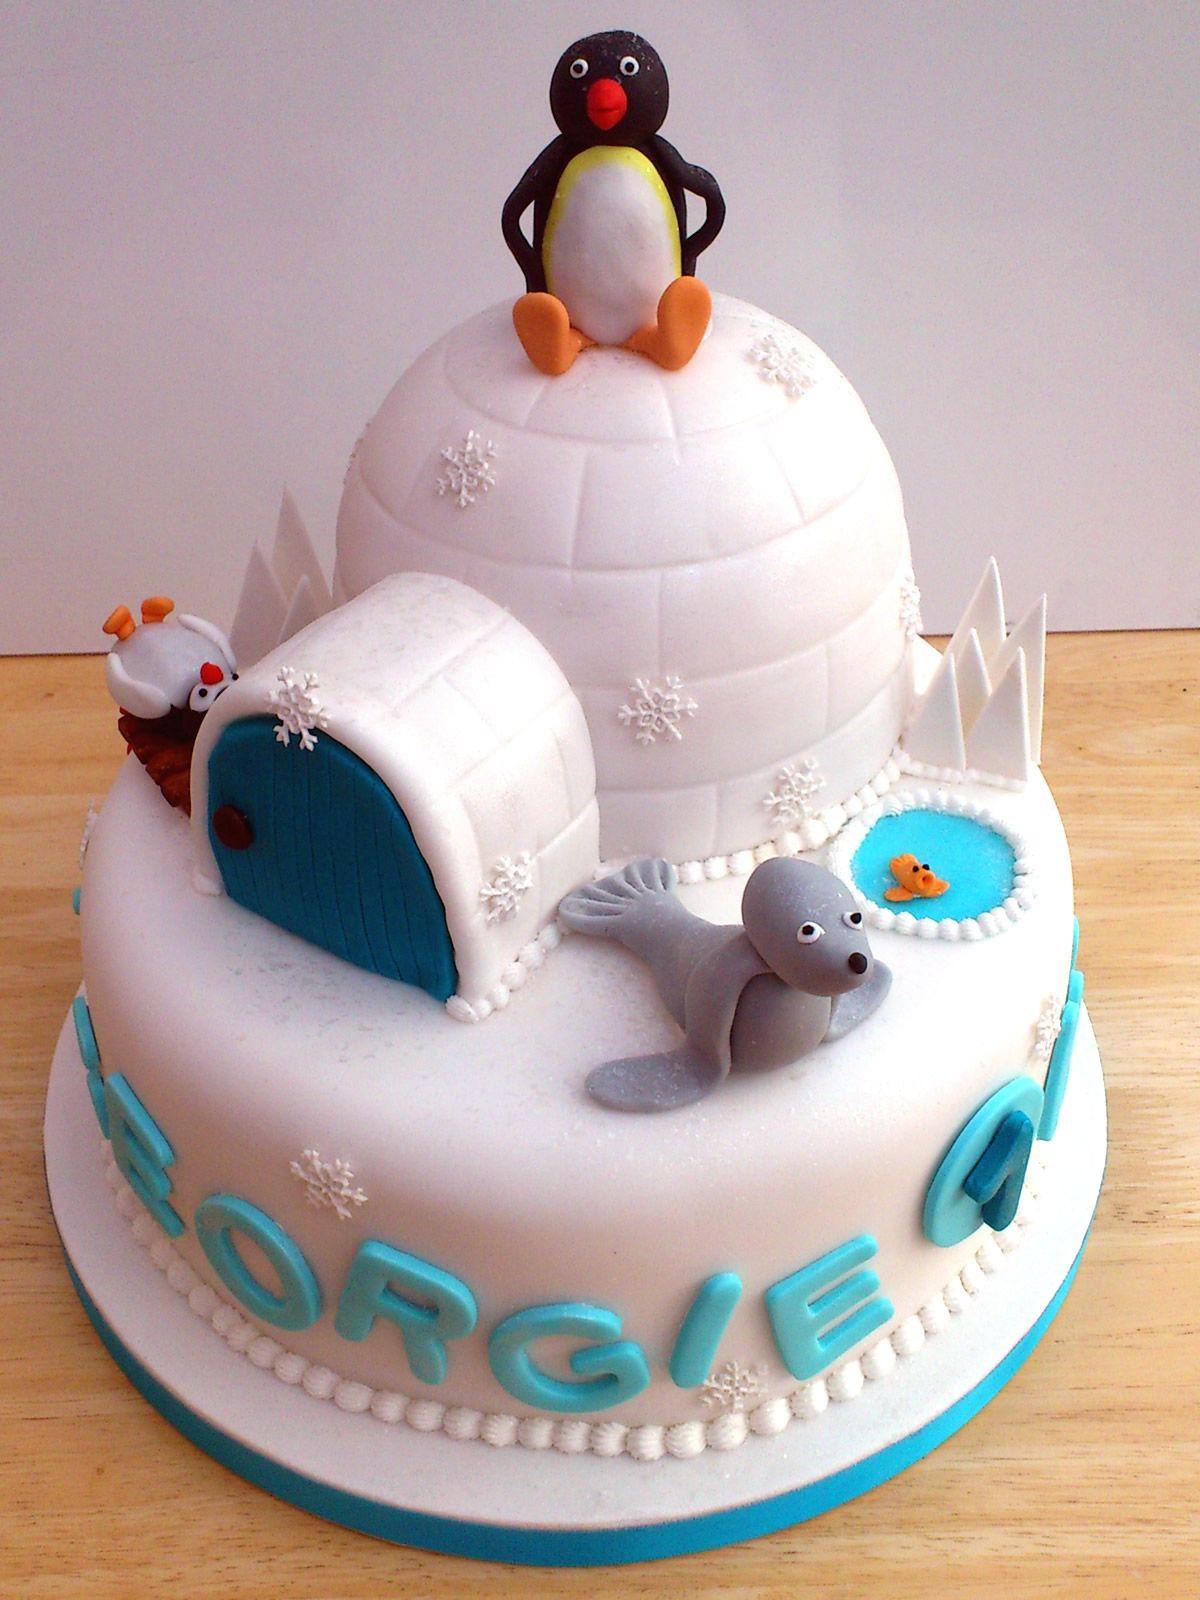 Pingu And Friends Novelty Birthday Cake